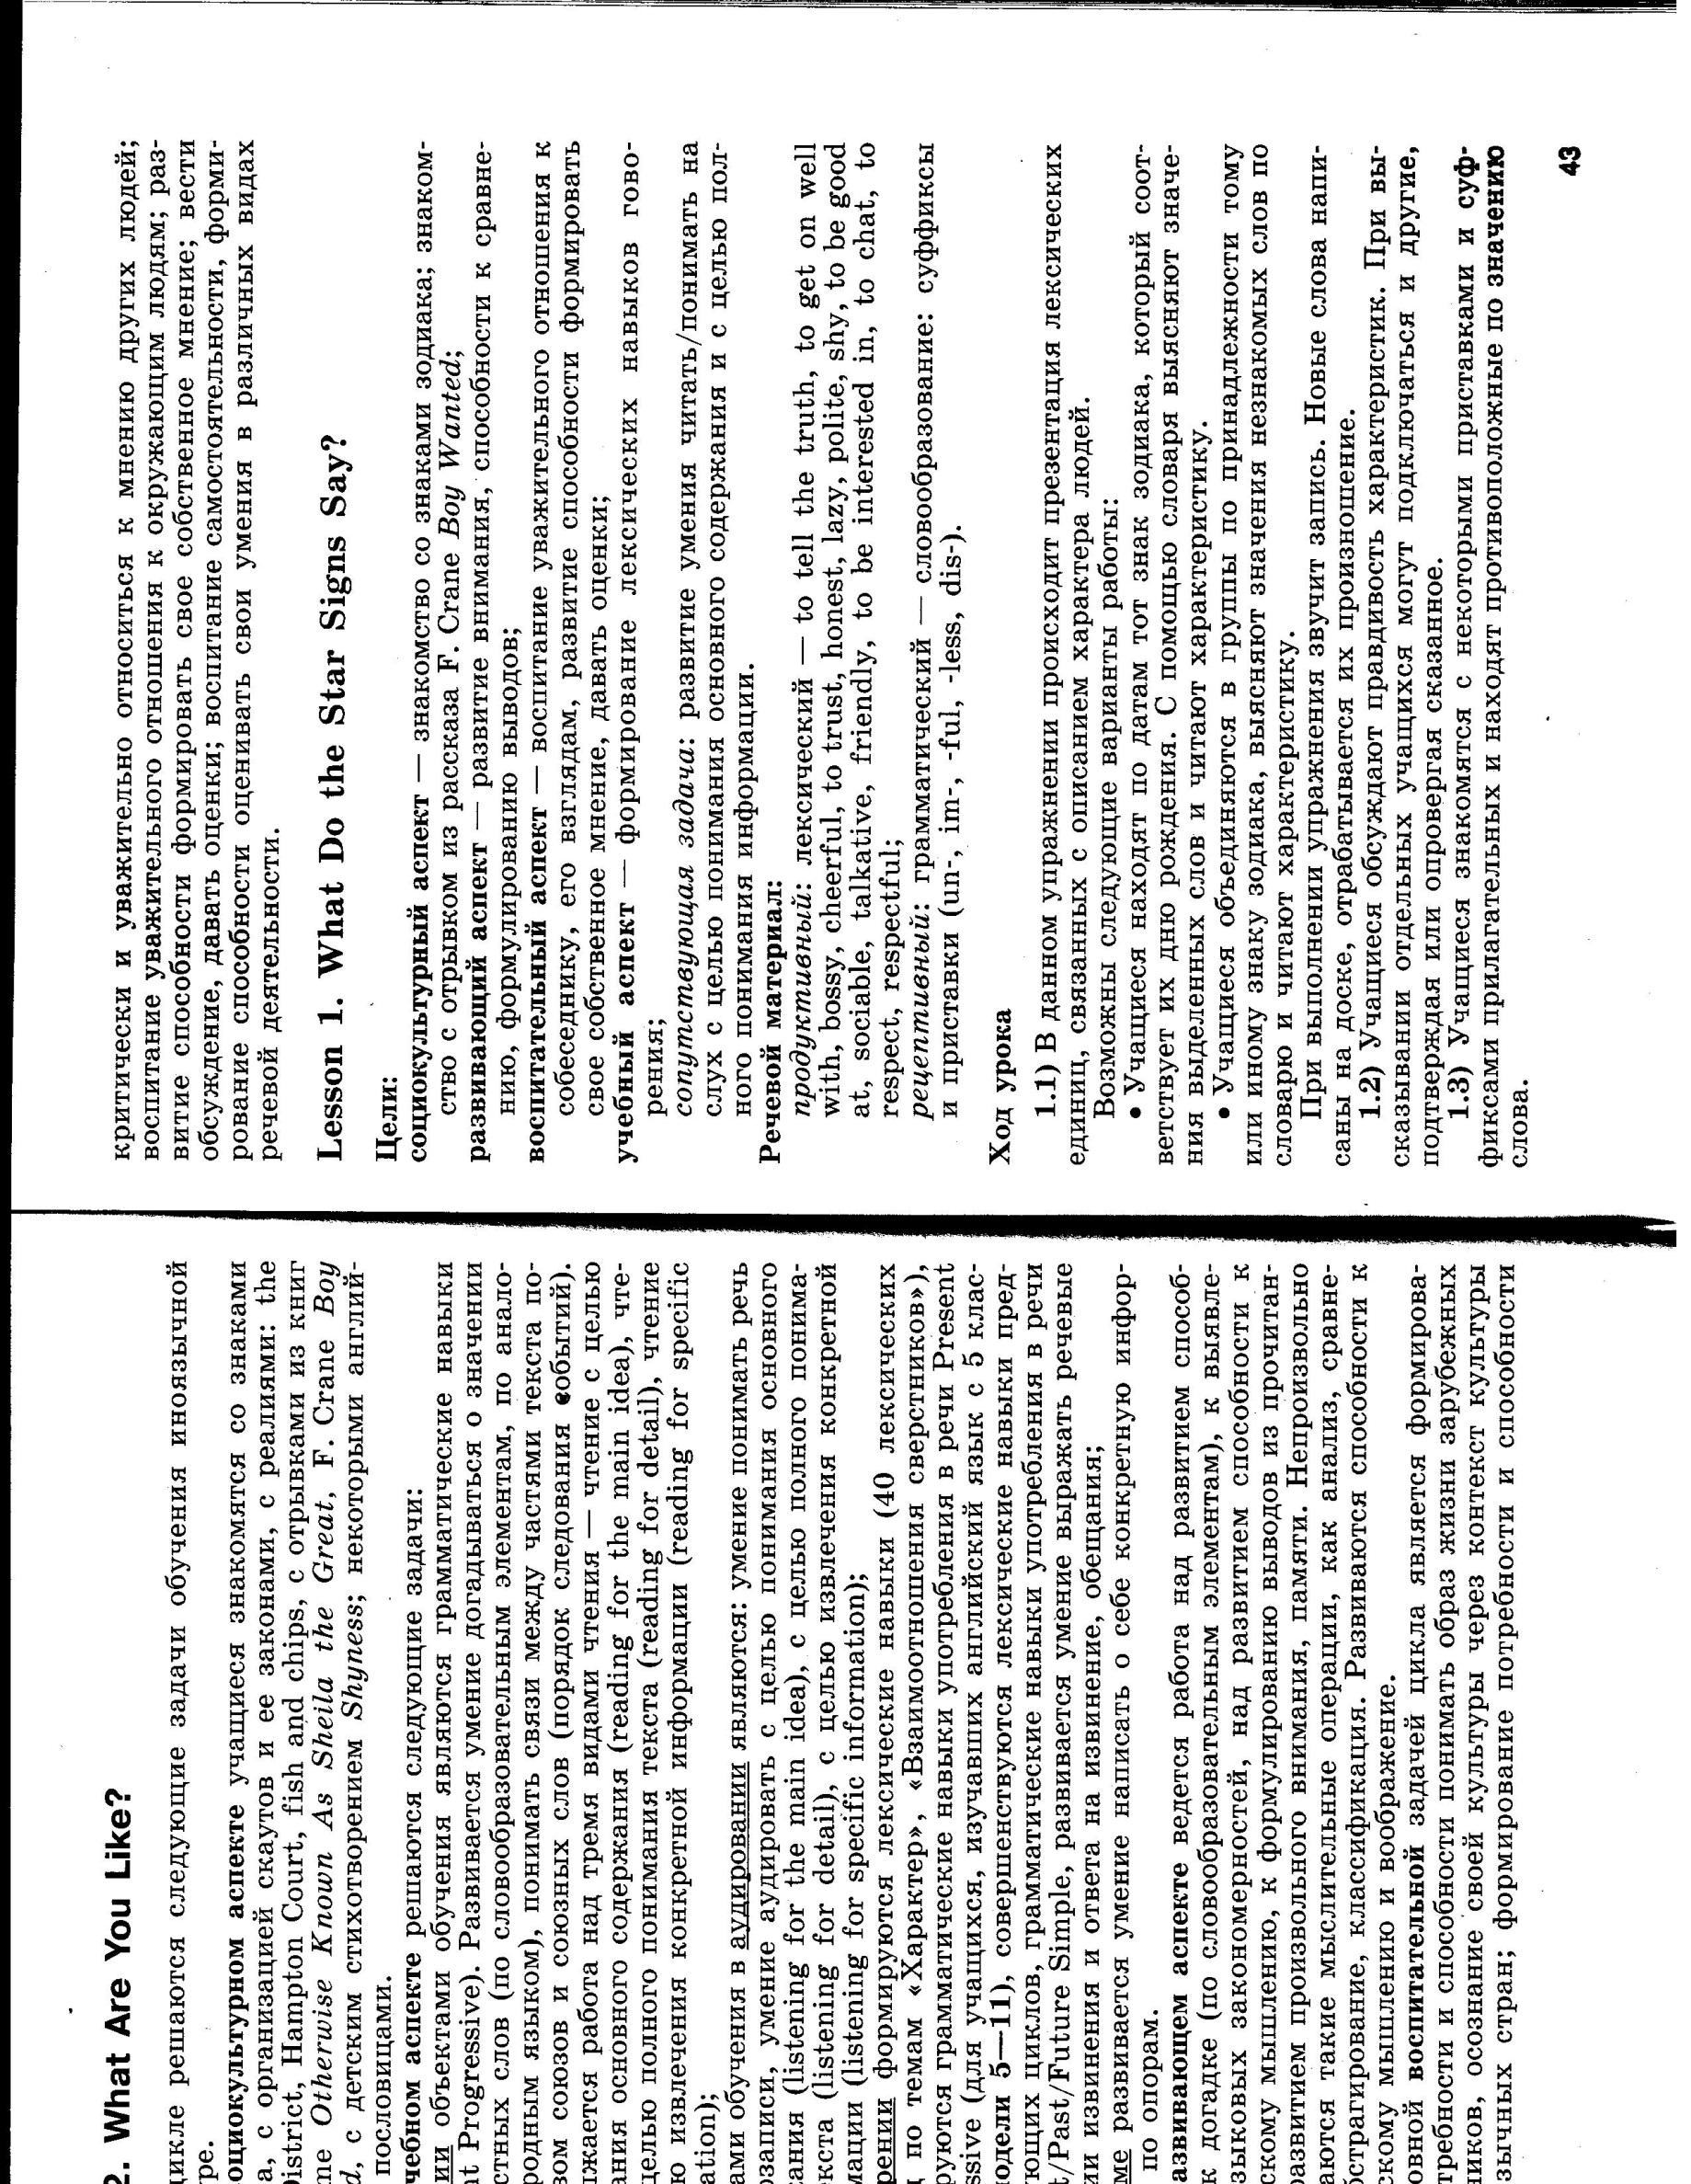 C:\Users\Грузиновская СОШ\Documents\Scanned Documents\Рисунок (2073).jpg